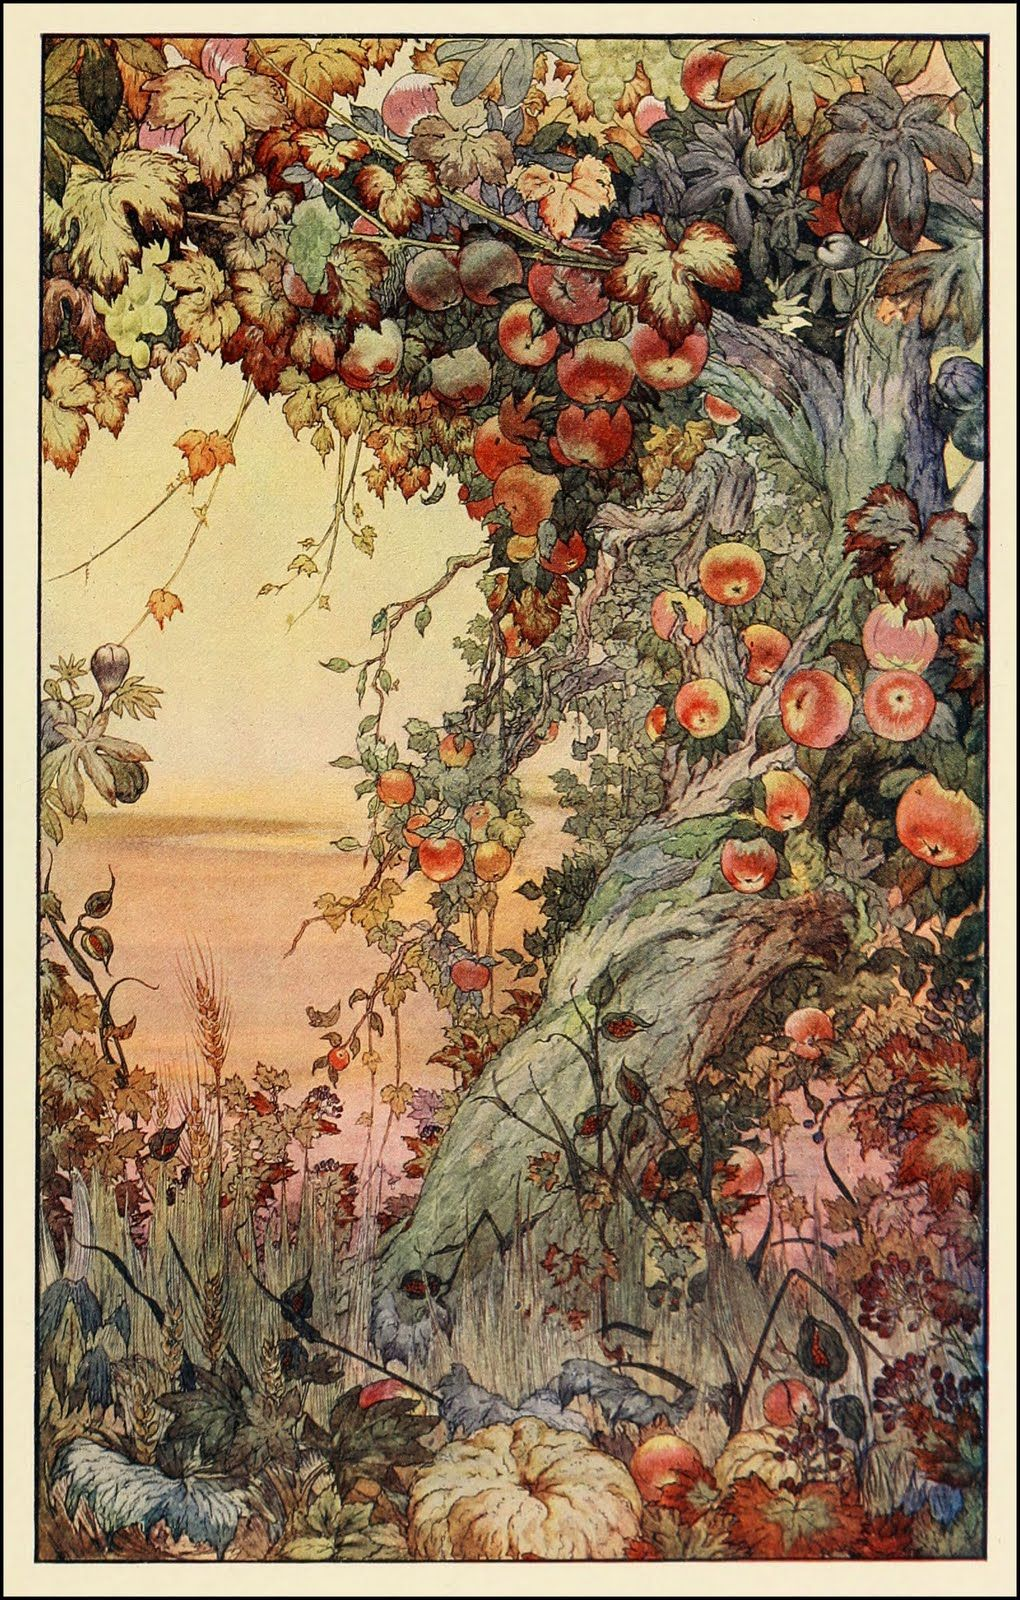 Edward J Detmold, Fruits of the Earth